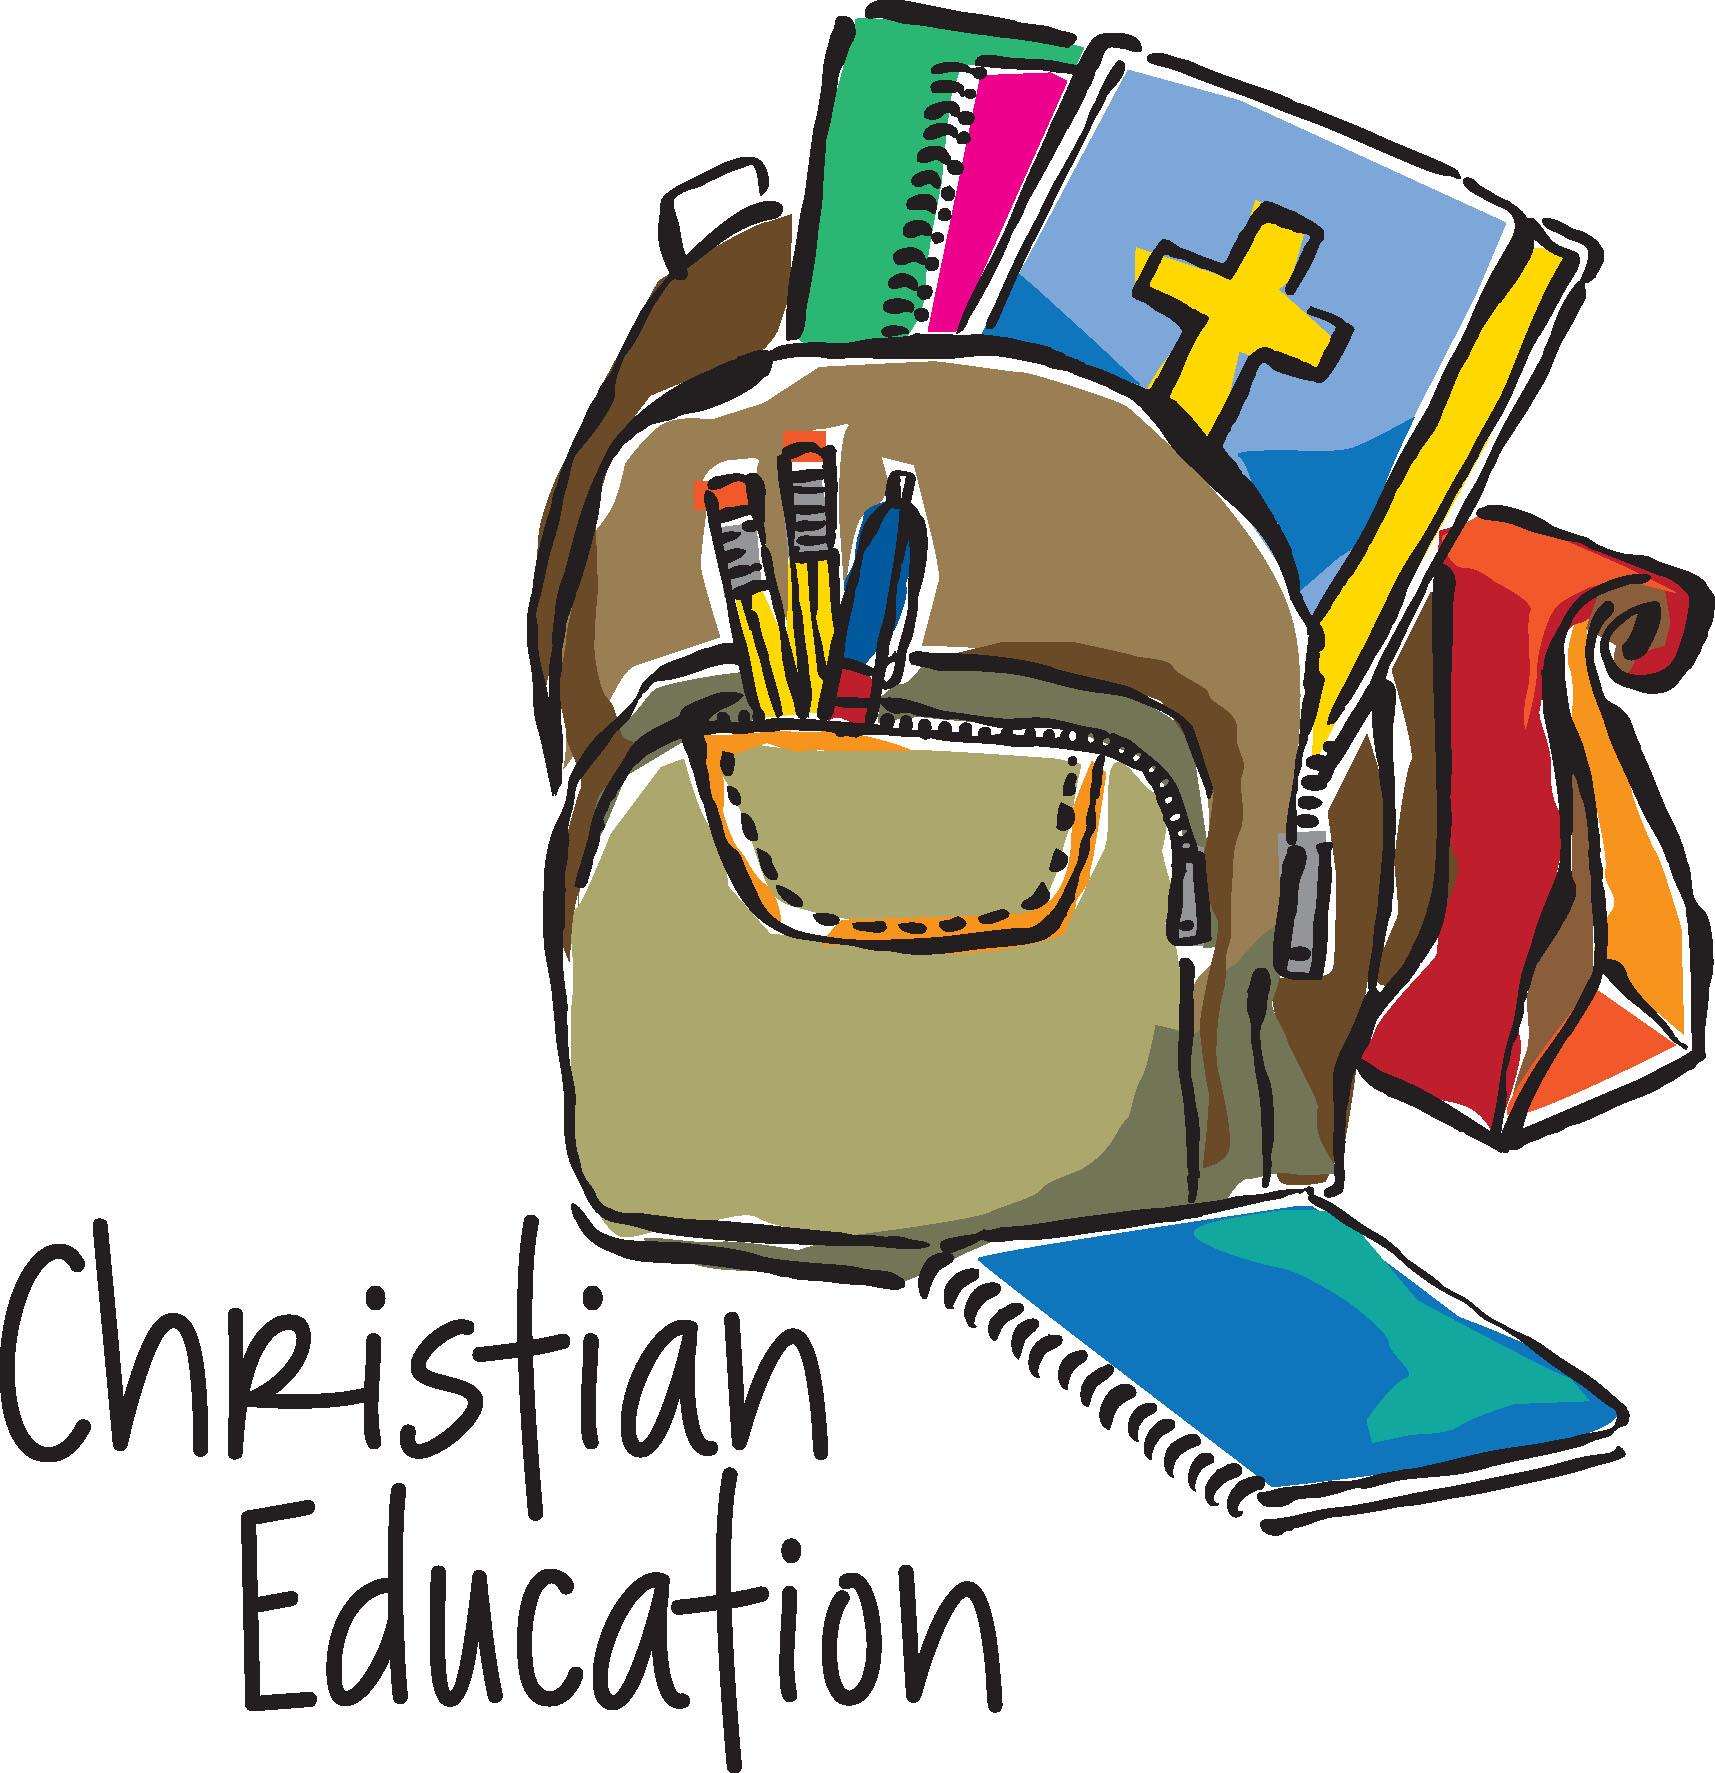 1715x1773 School Clipart Education Clip Art School For Teachers 4